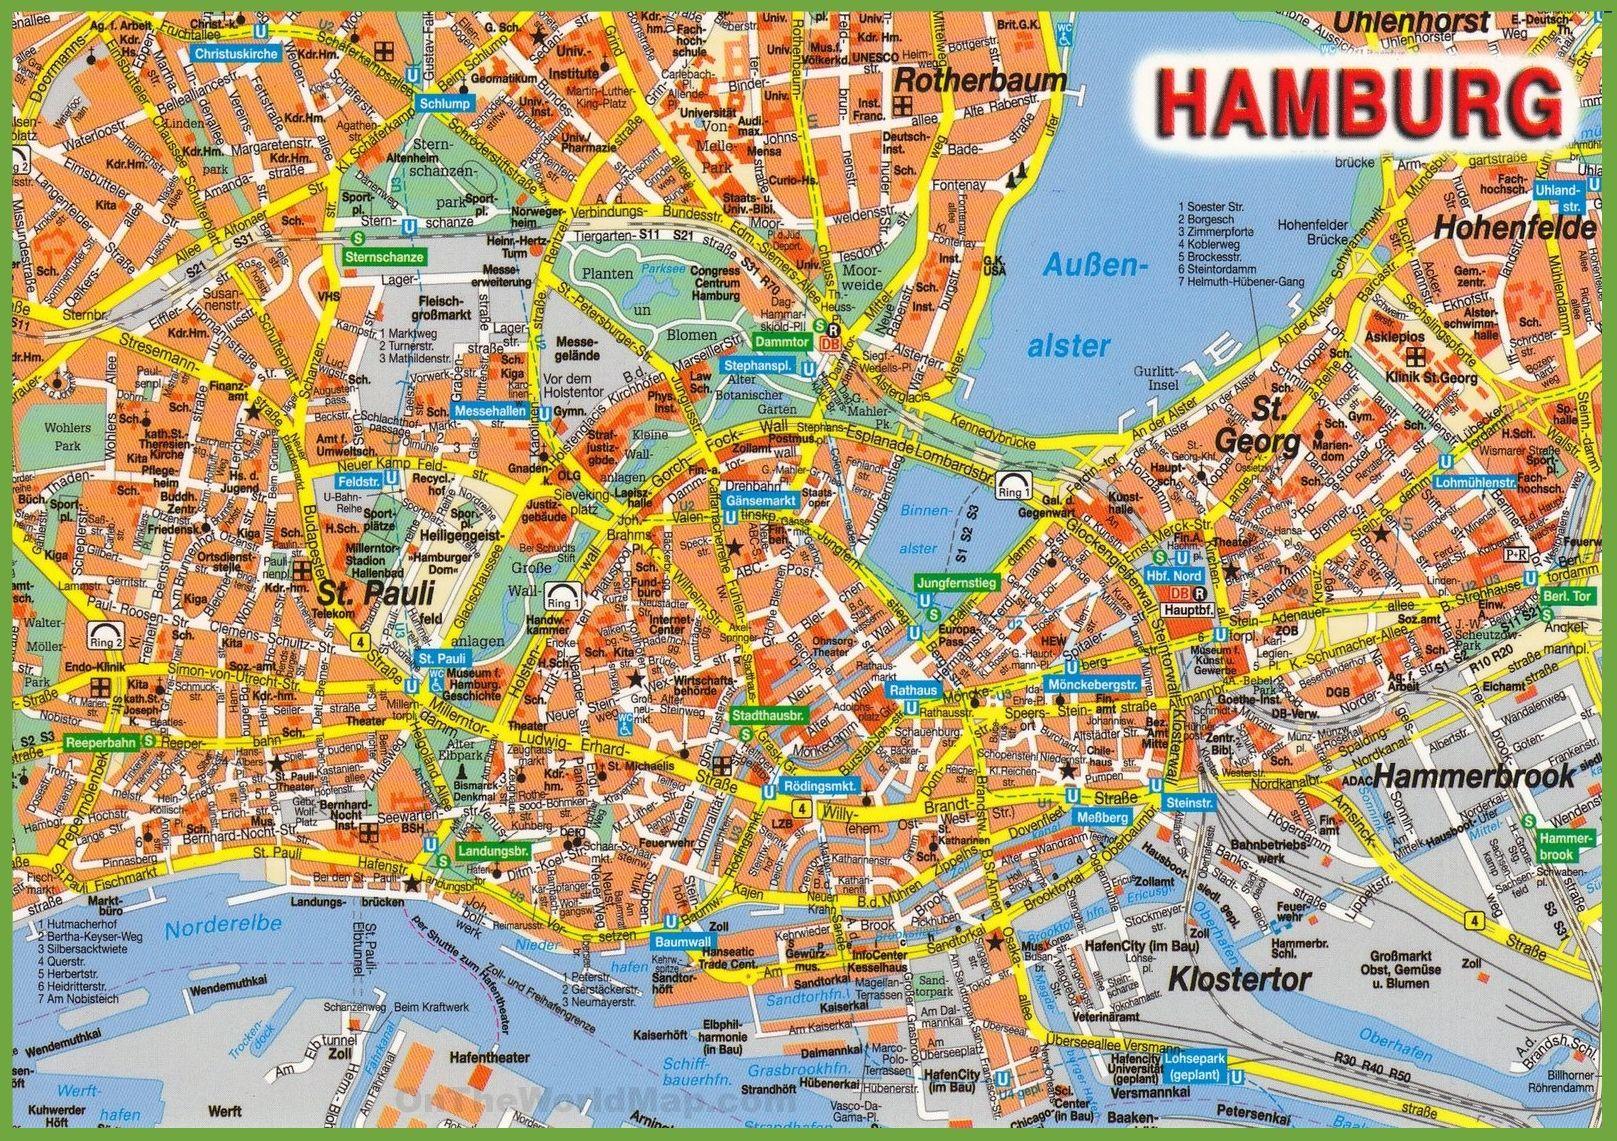 hamburg tourist attractions map